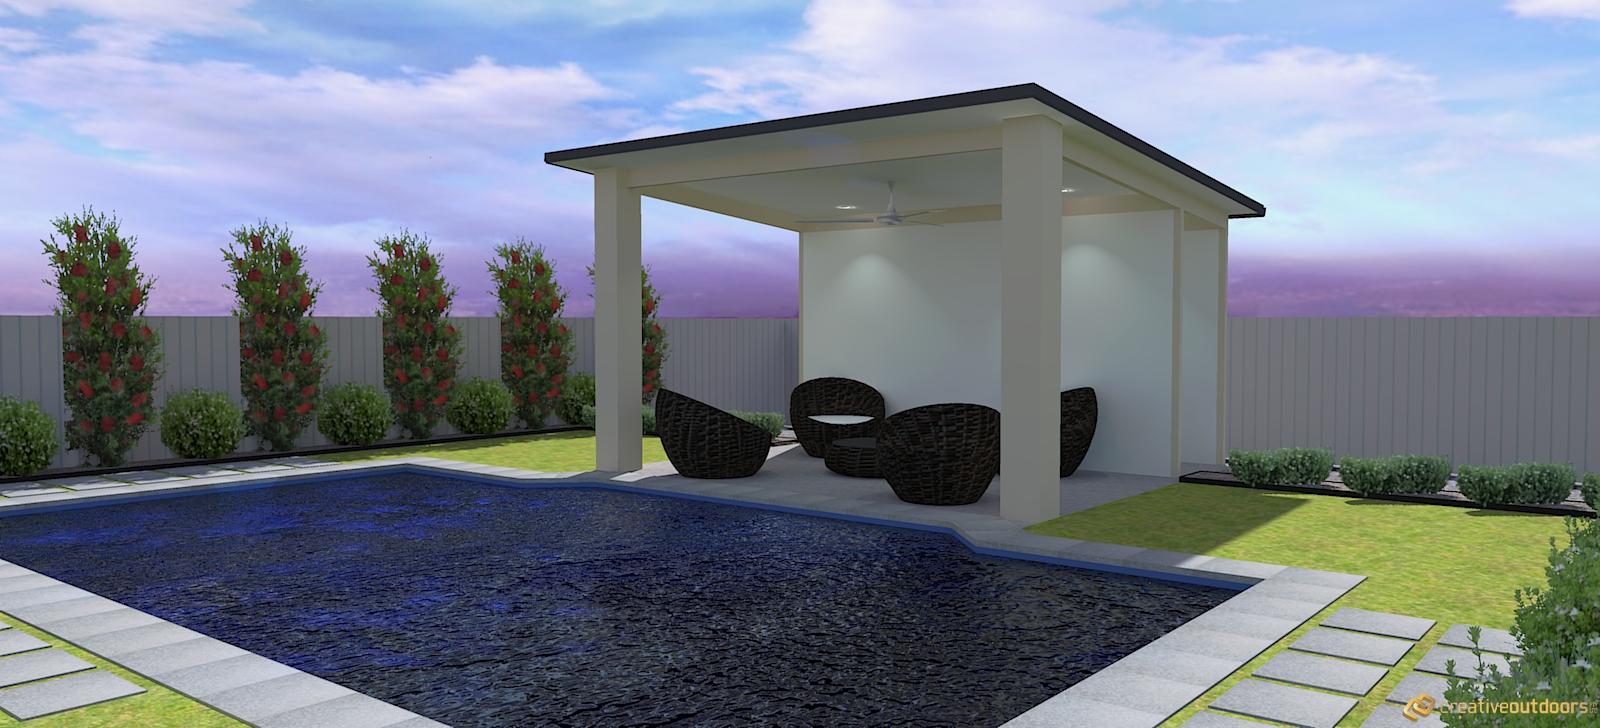 Creative-Outdoors-Outdoor-Concept-Custom-Design-010